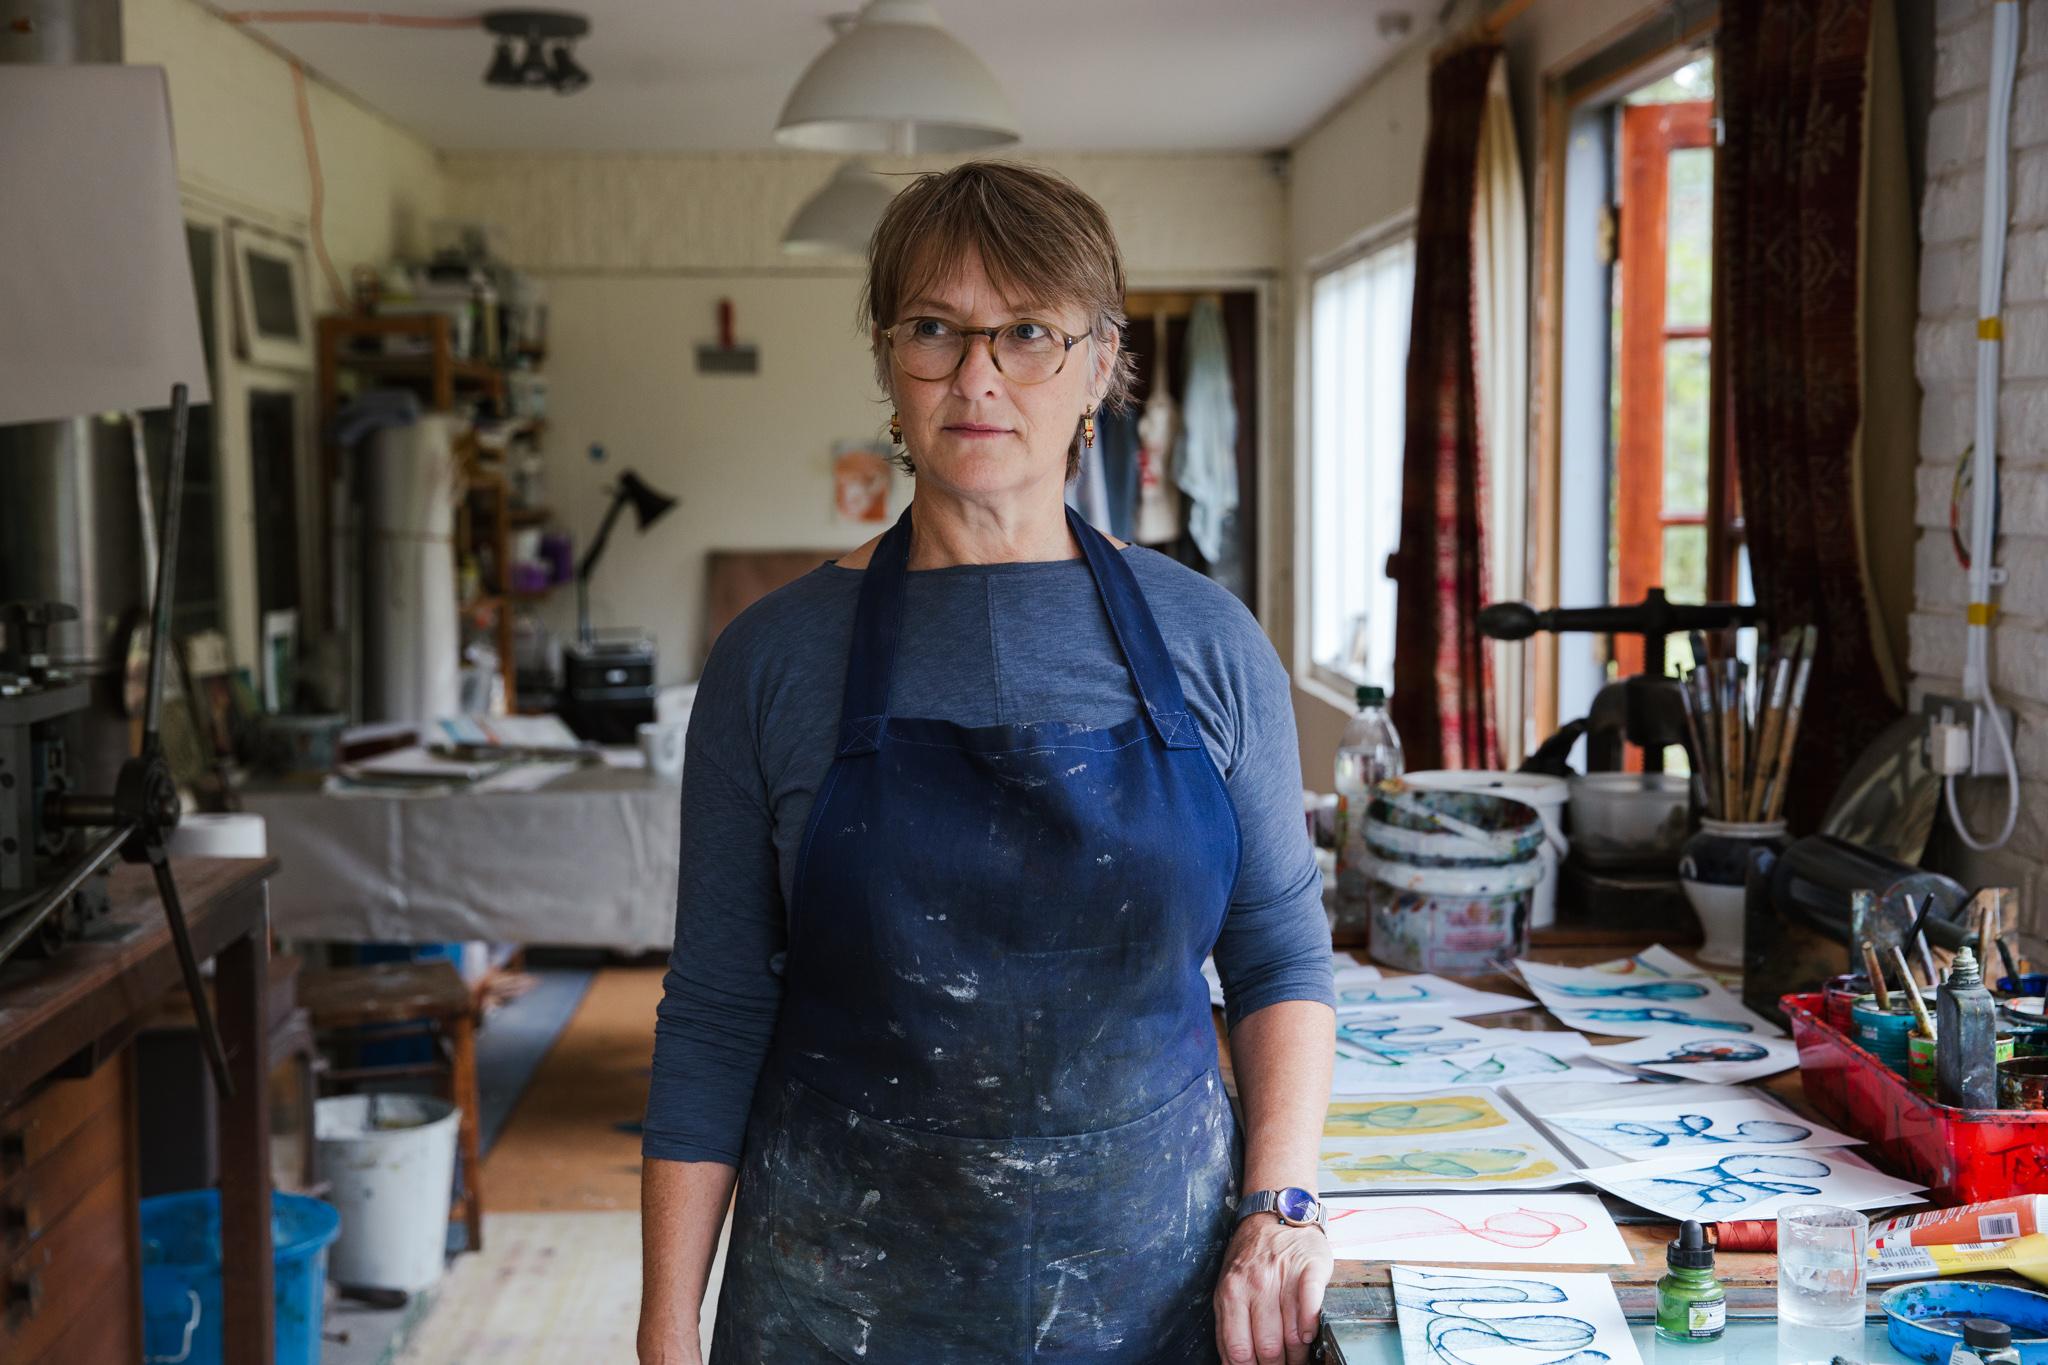 Lifestyle-artist-studio-Joanne-Crawford-Leeds-24.JPG